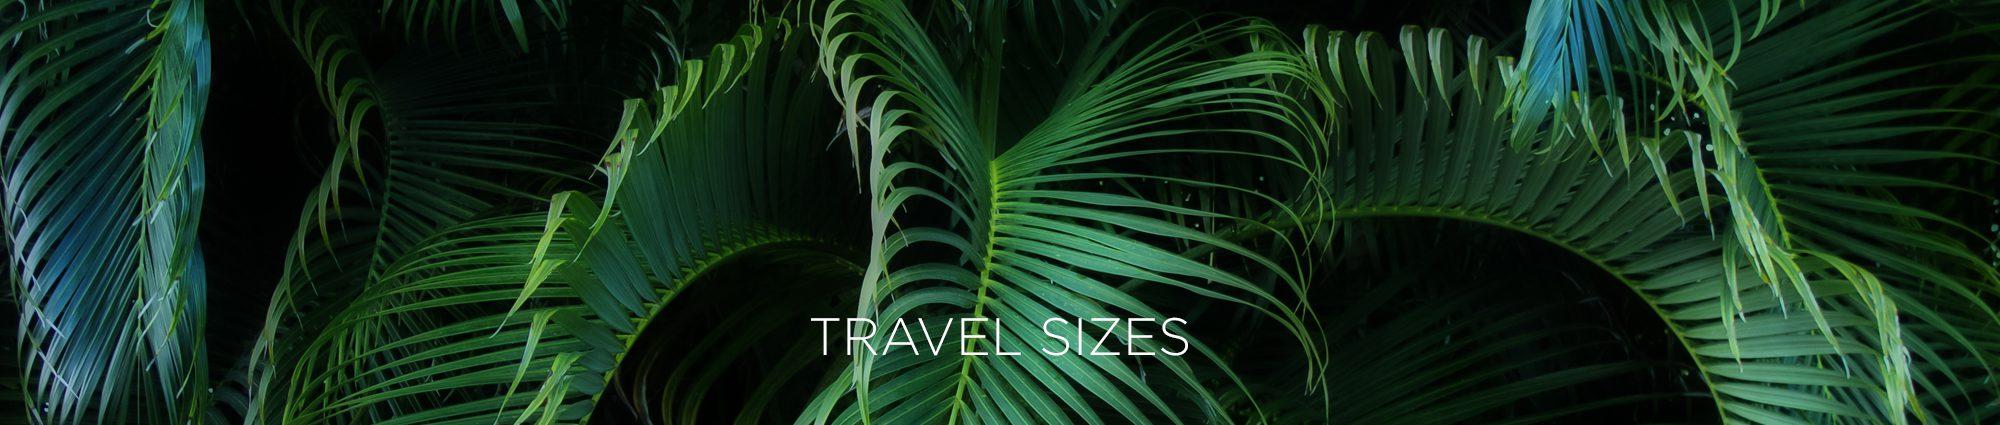 travelsizesheader